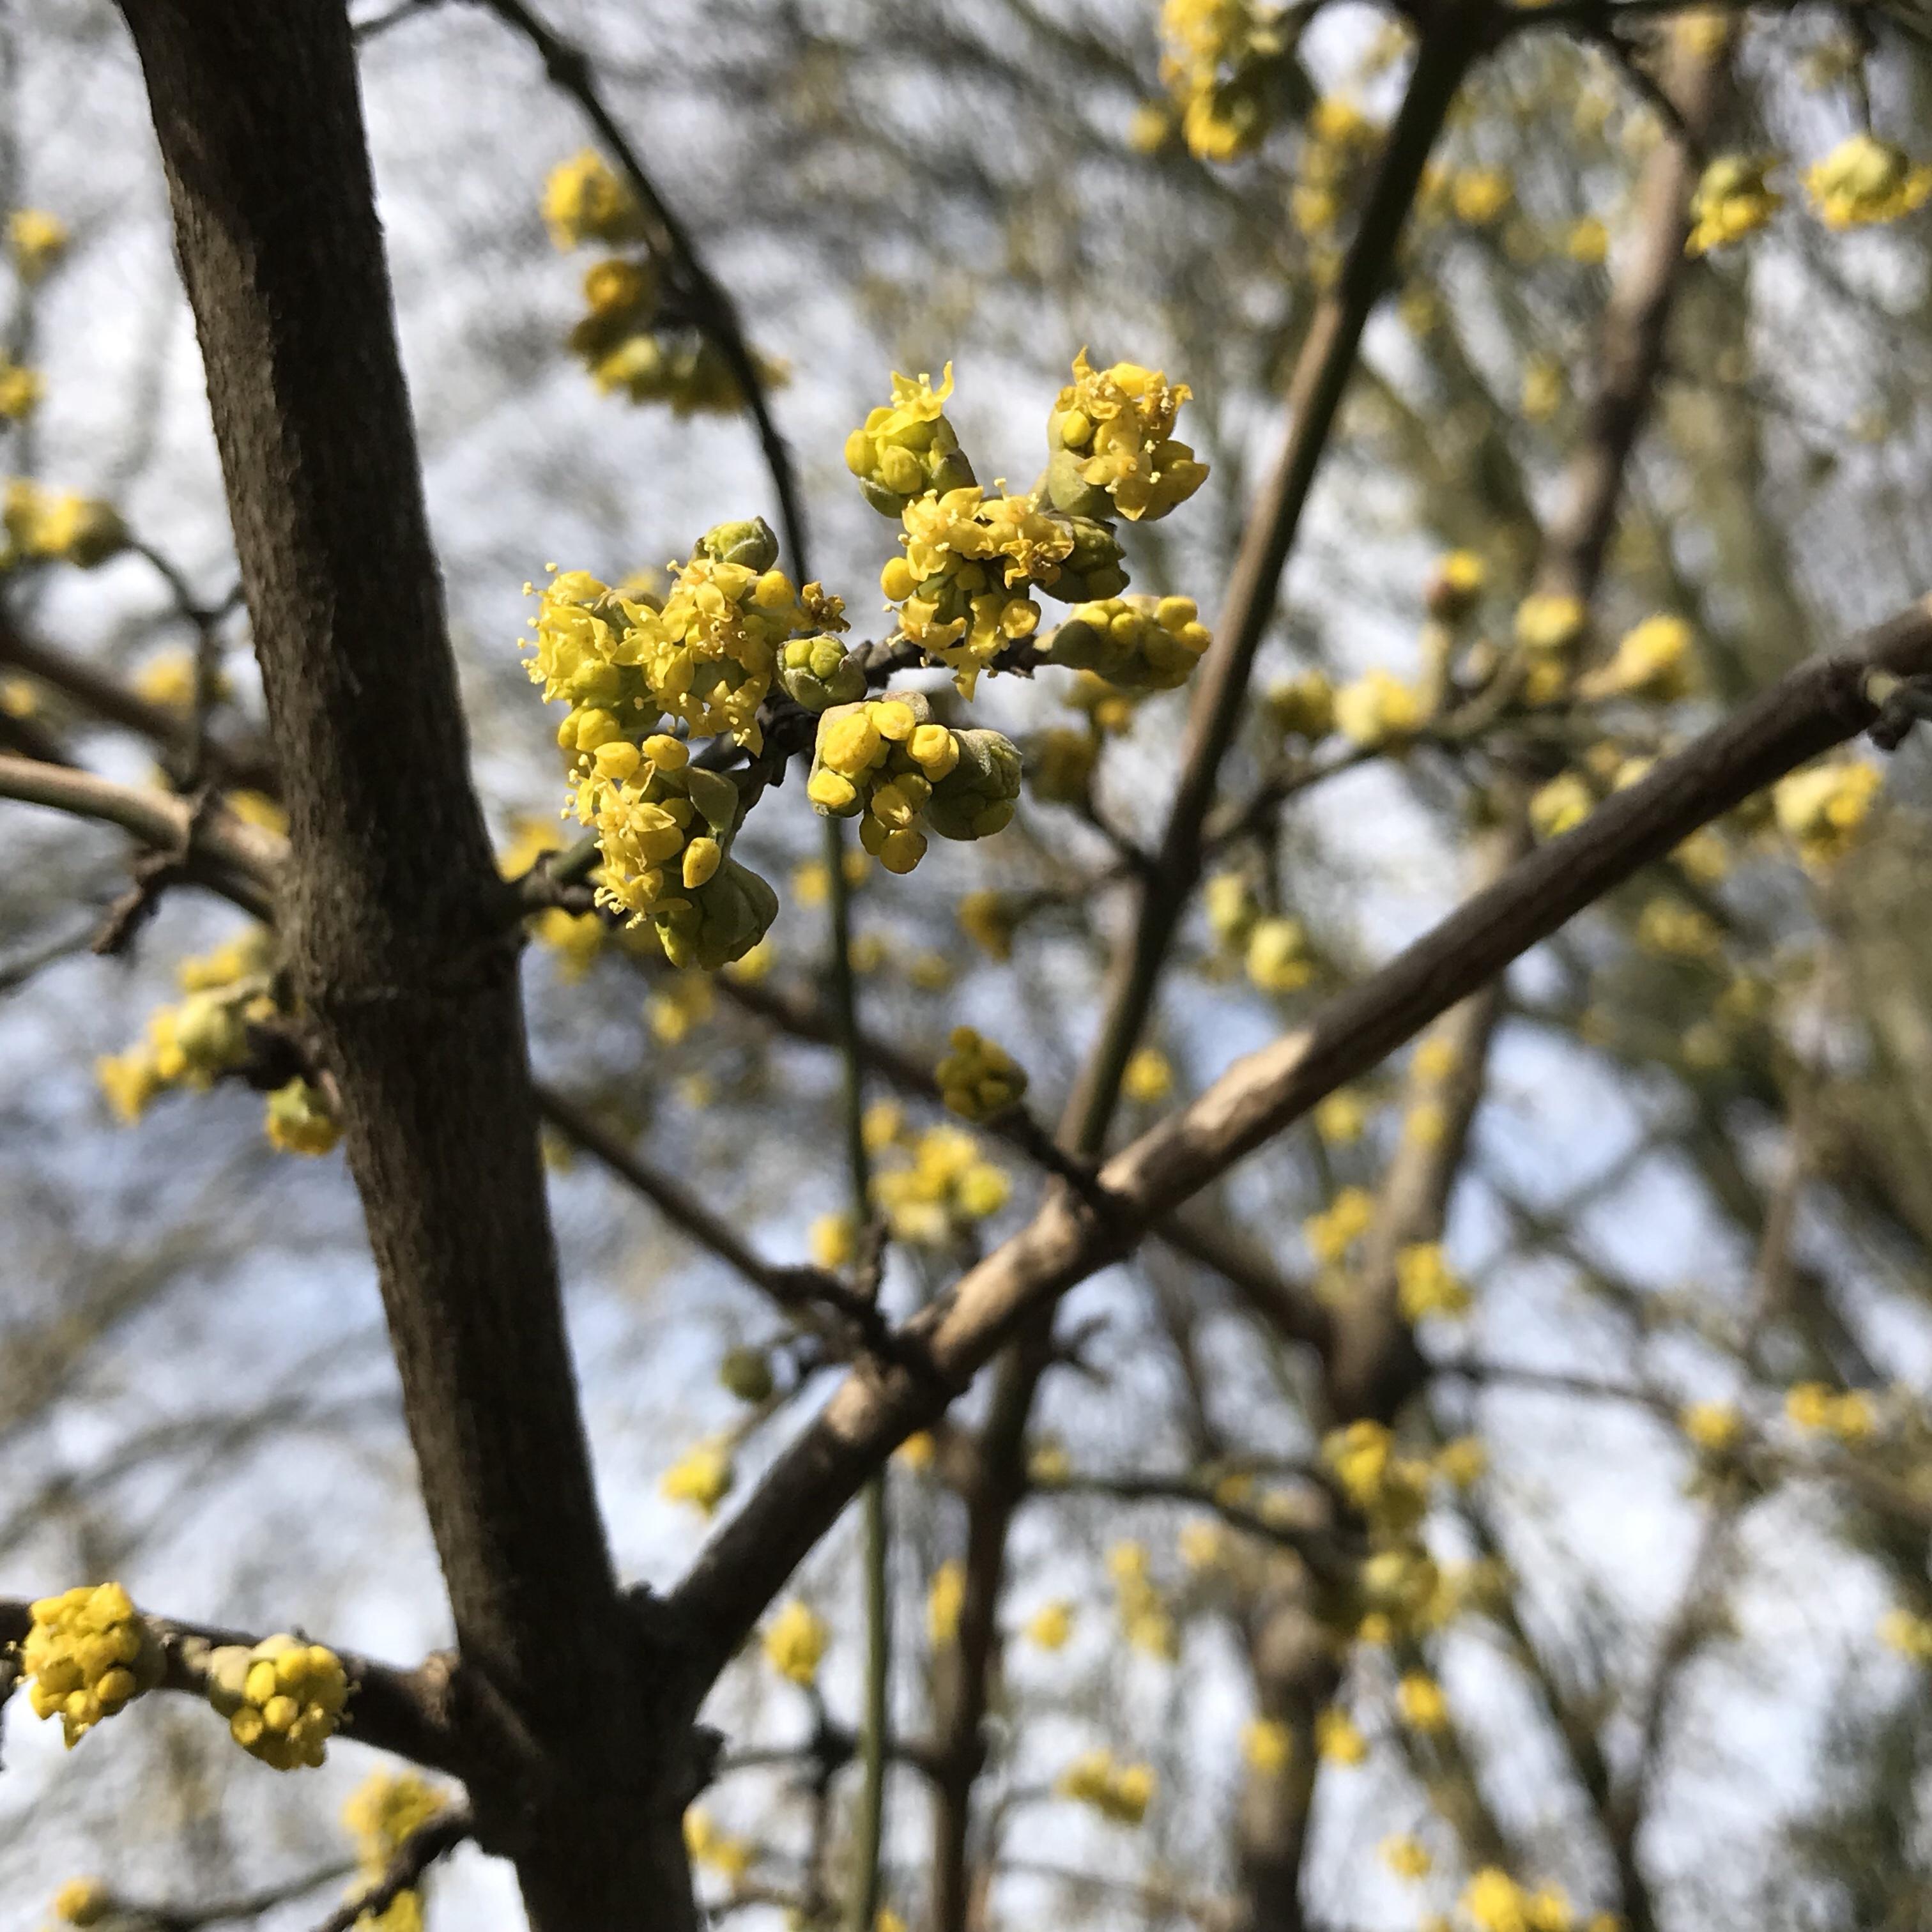 Frühling: Gelbe Blüten am Baum vor blauem Himmel